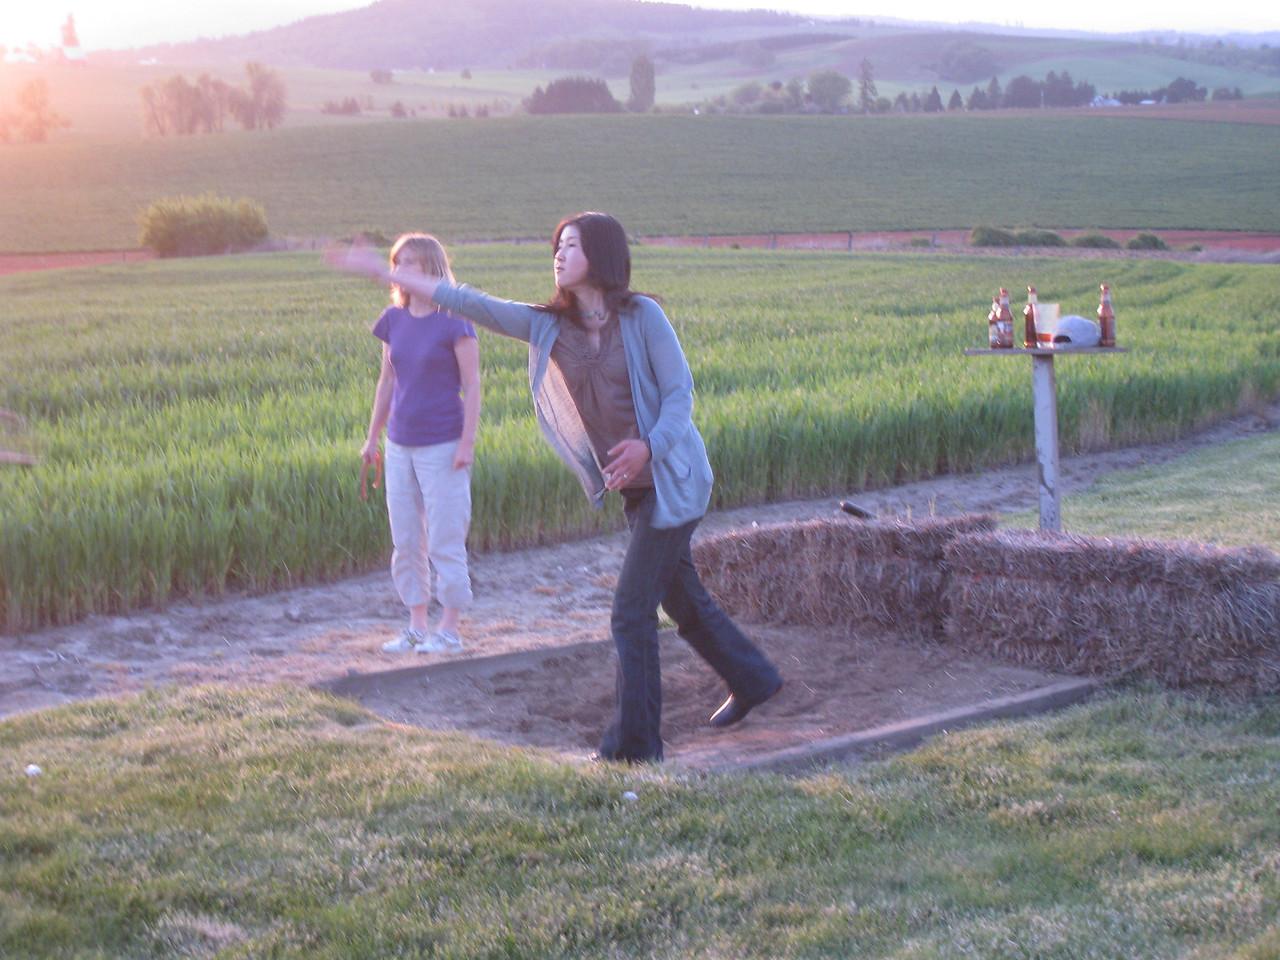 Chiyoko & Suzy playing Horseshoes.